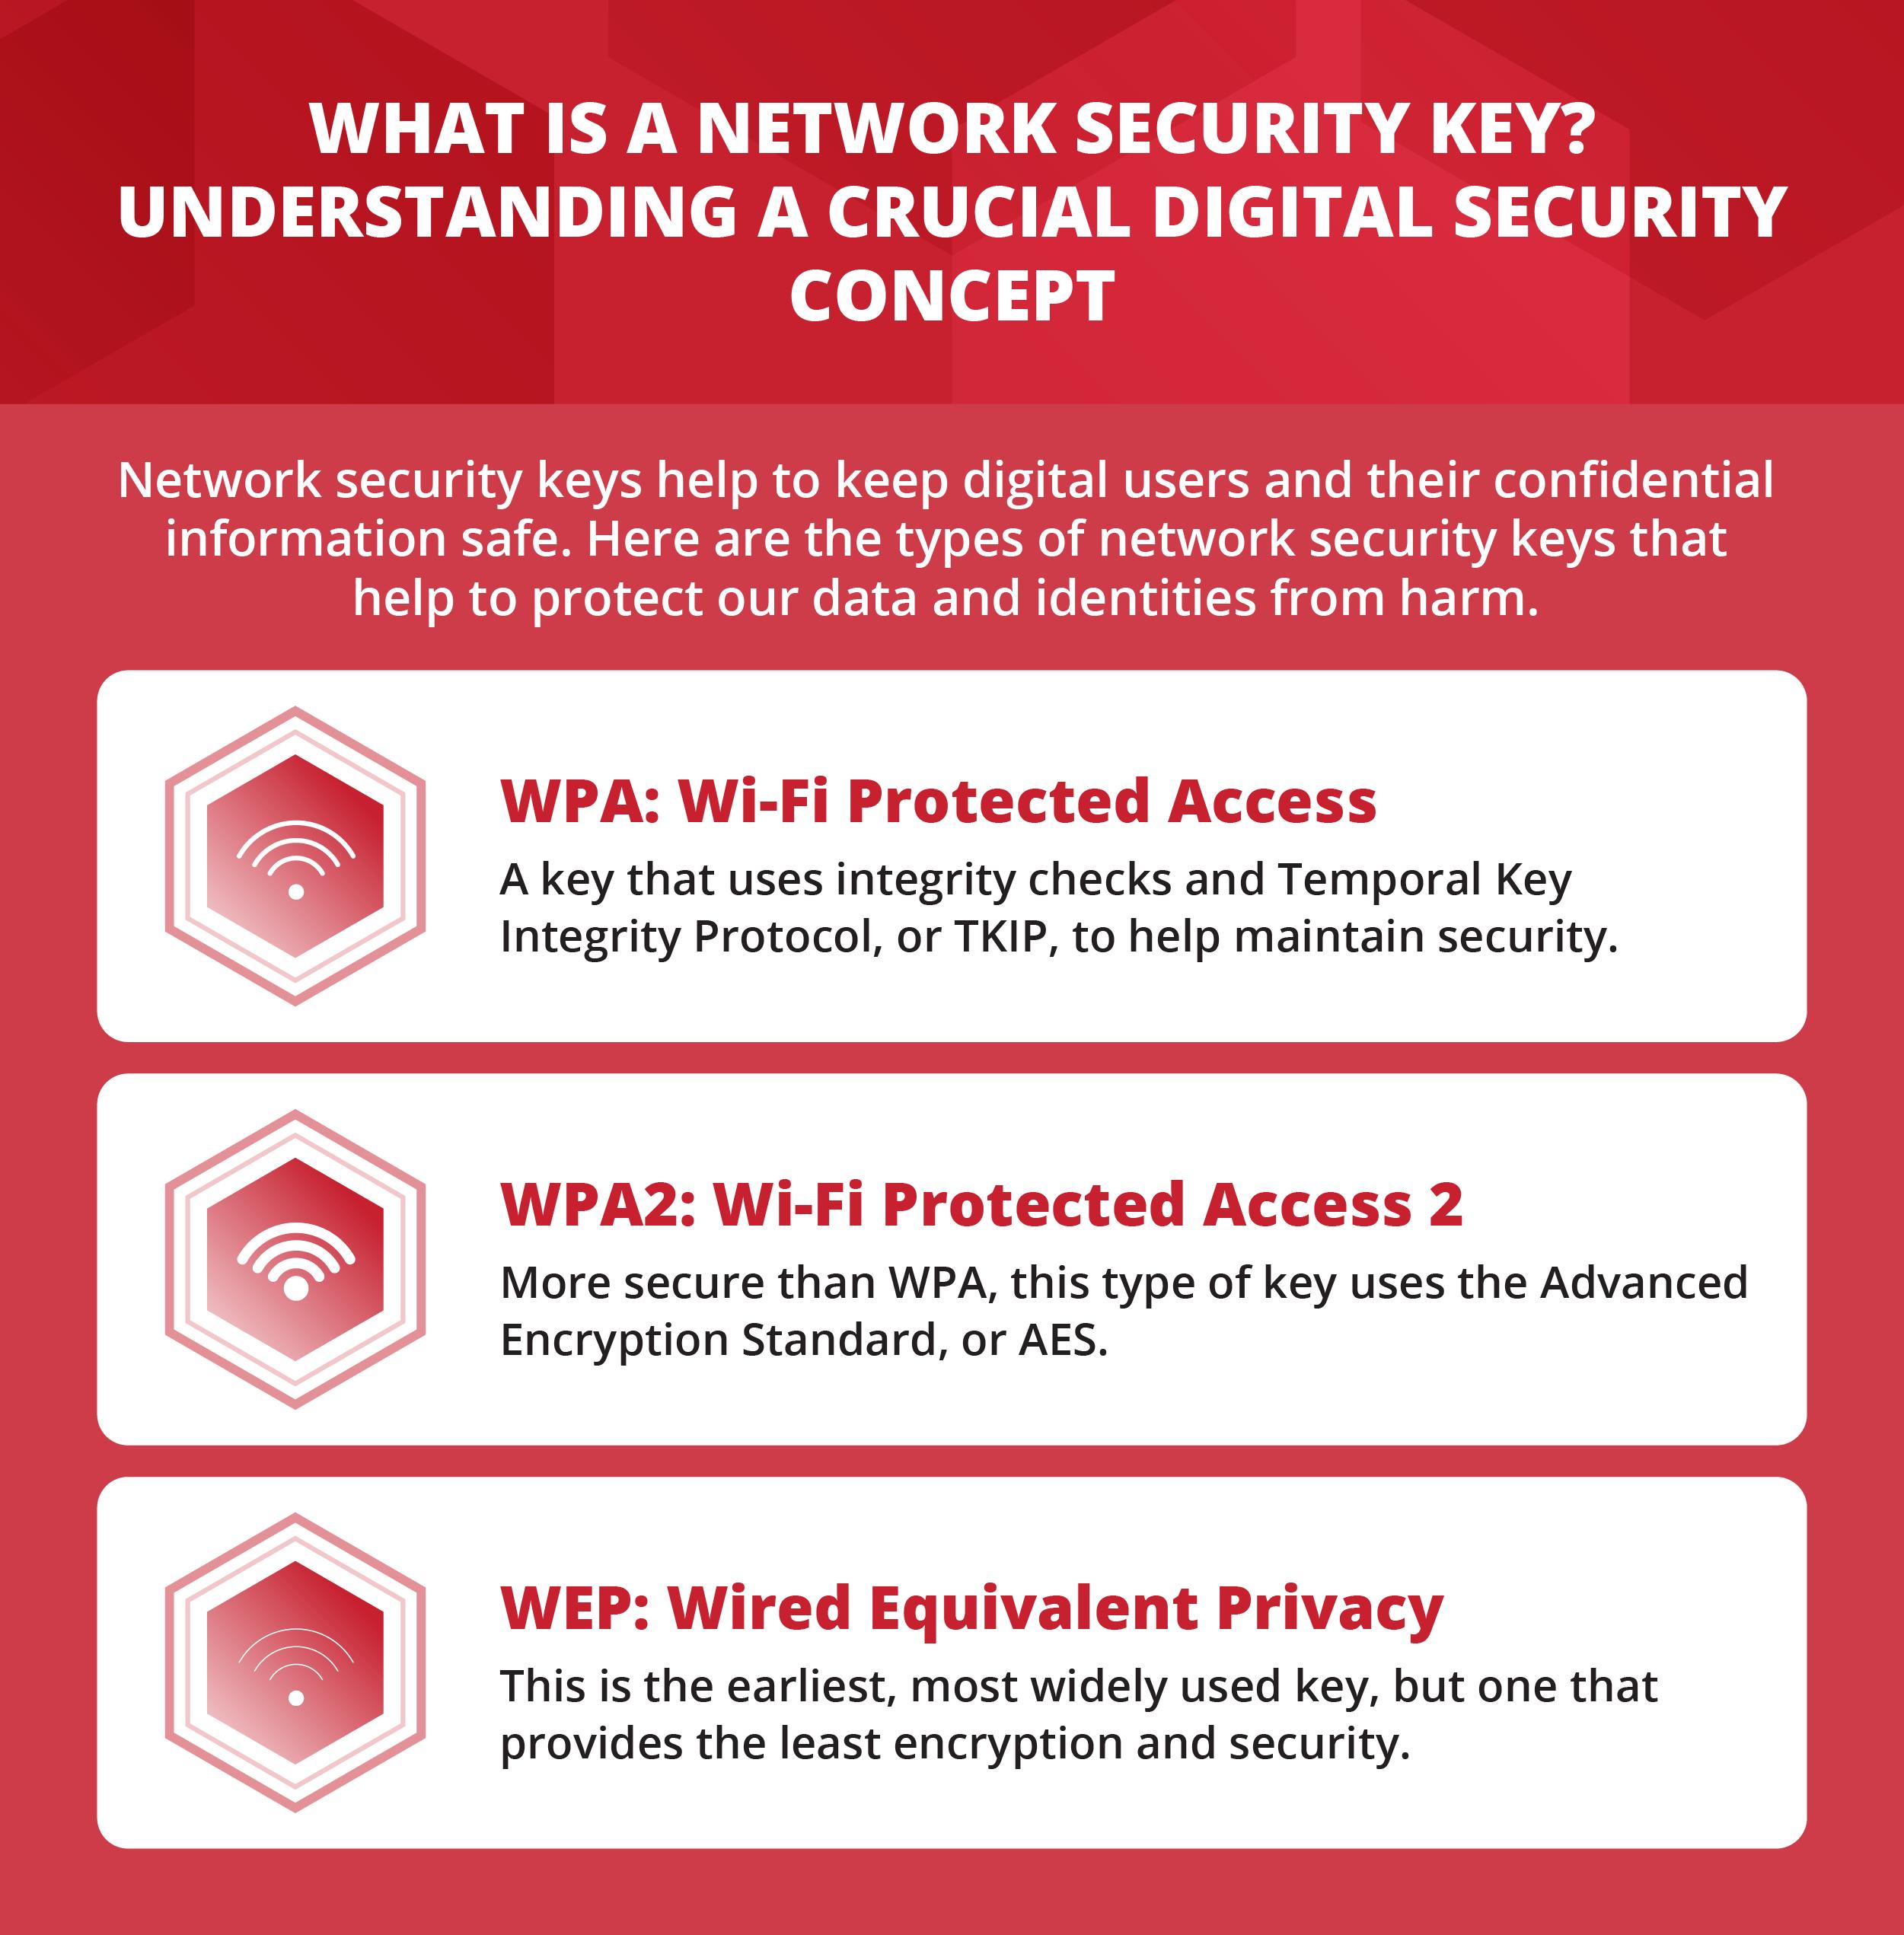 Understanding a crucial digital security concept